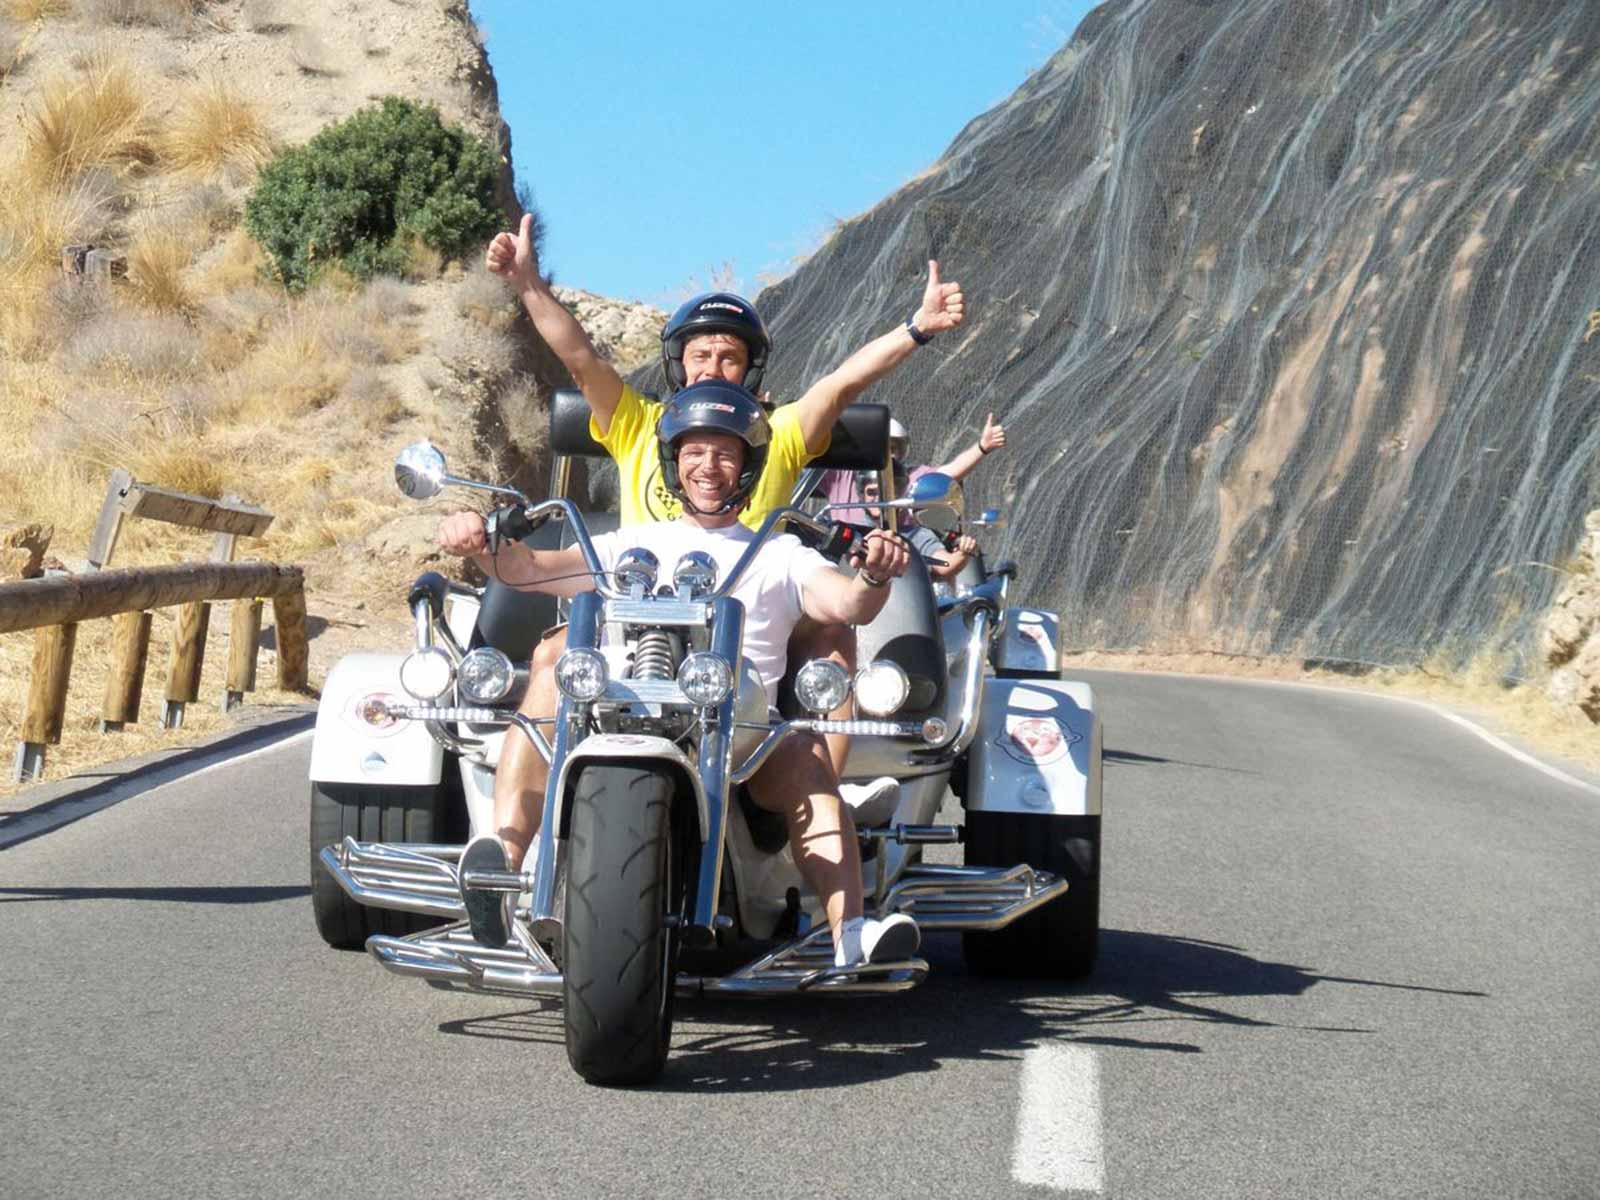 Trike-Mallorca-Trike-Tour-Mallorca-11